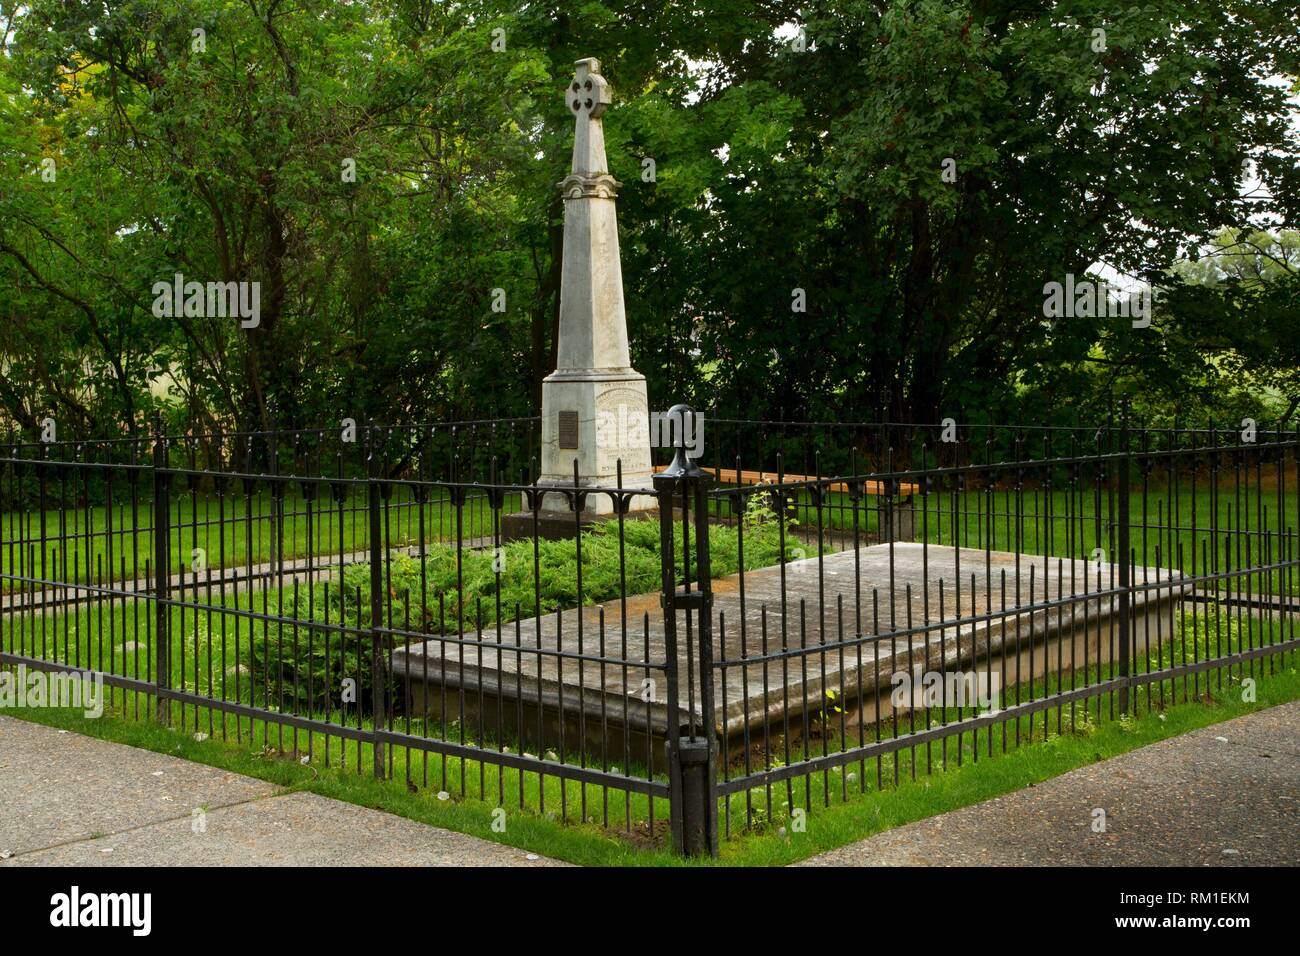 Great Grave, Whitman Mission National Historic Site, Washington. - Stock Image